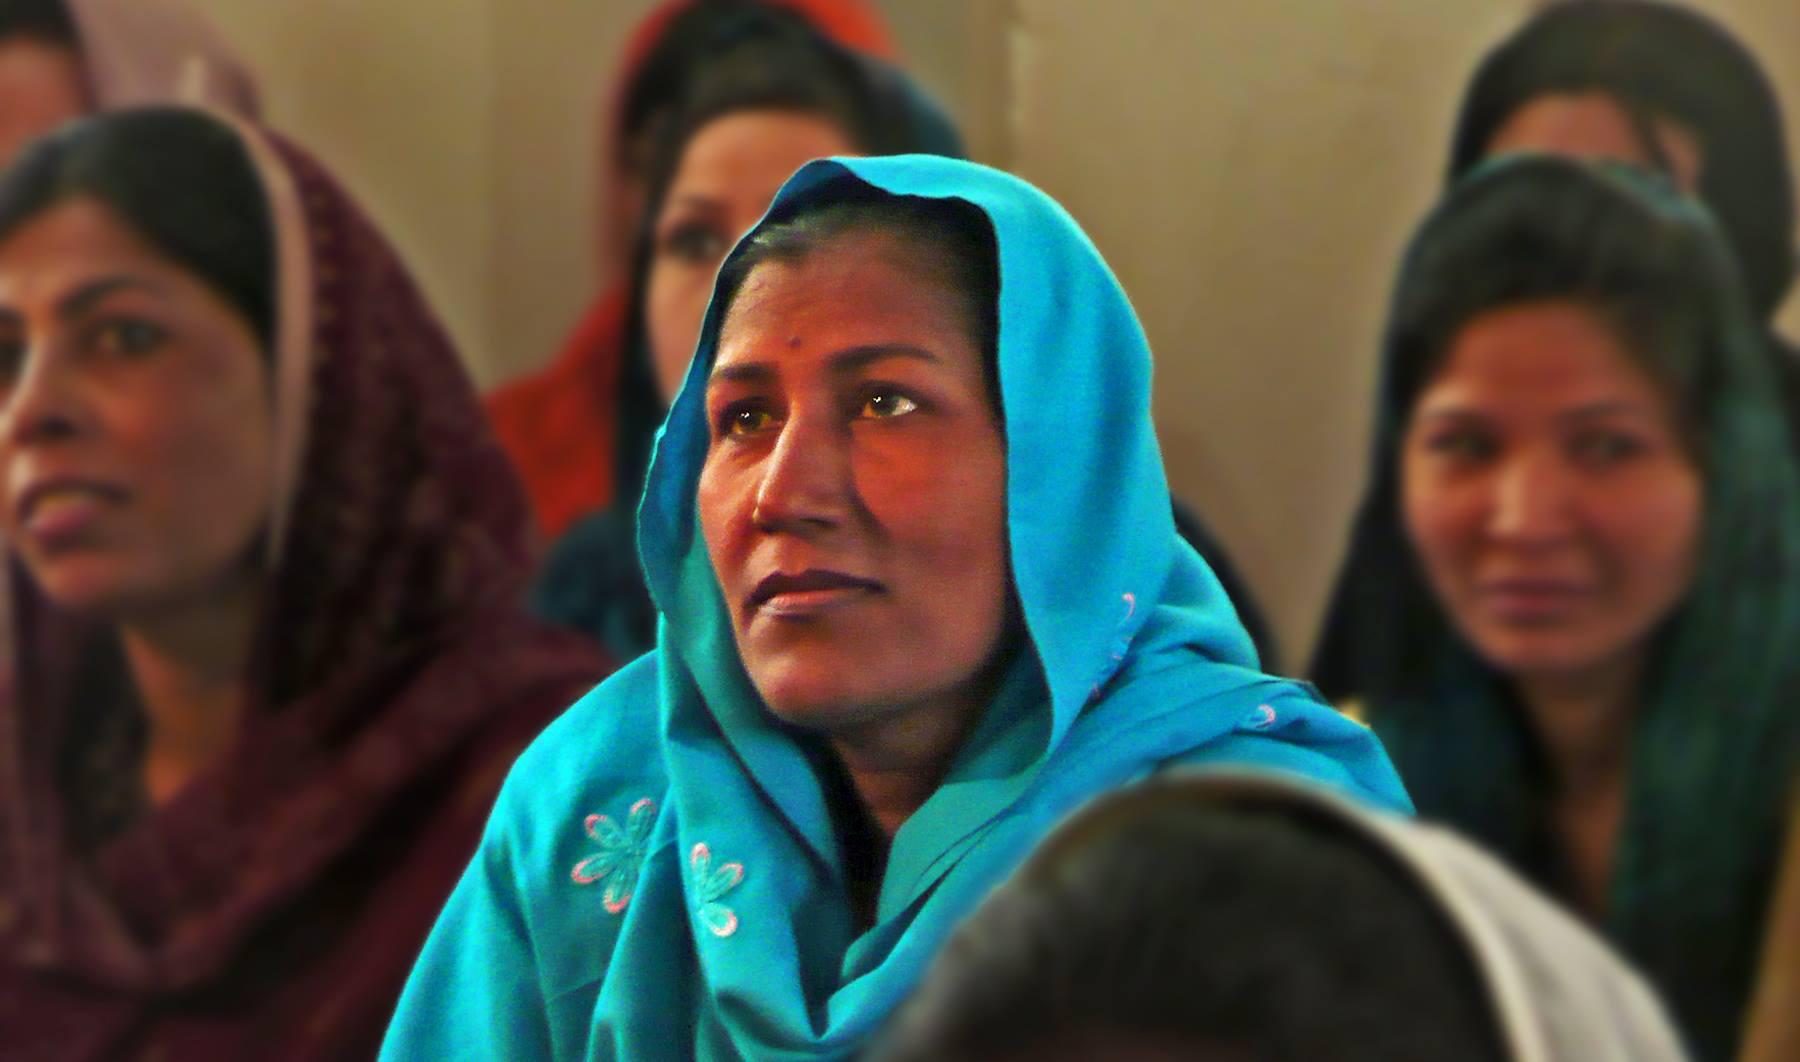 Pakistani Christian Women Serve Jesus Despite Constant Oppression